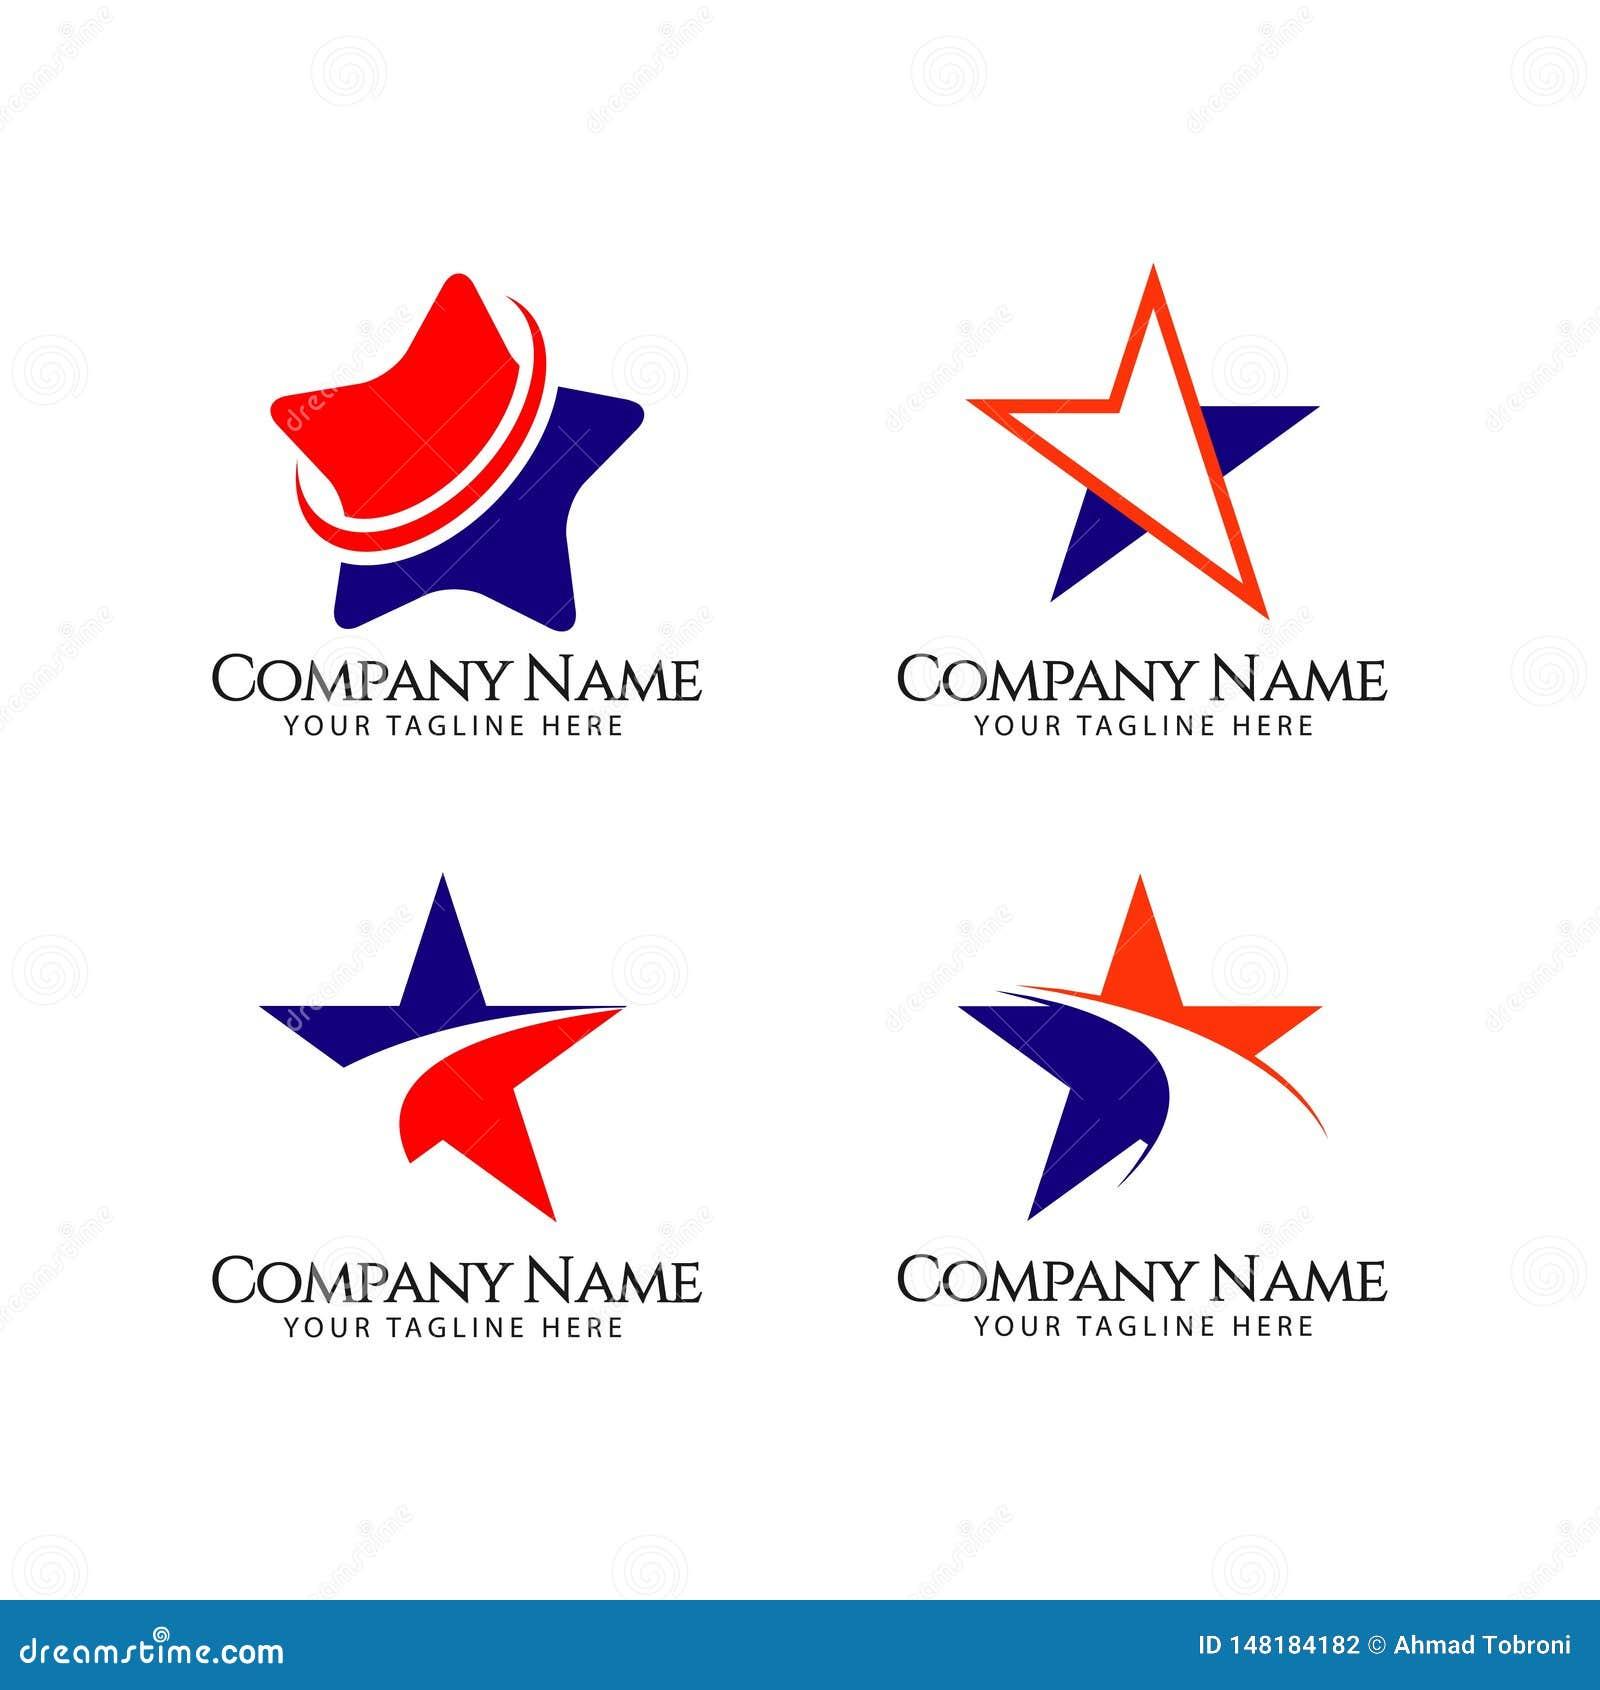 Star Company Logo Vector Template Design Illustration